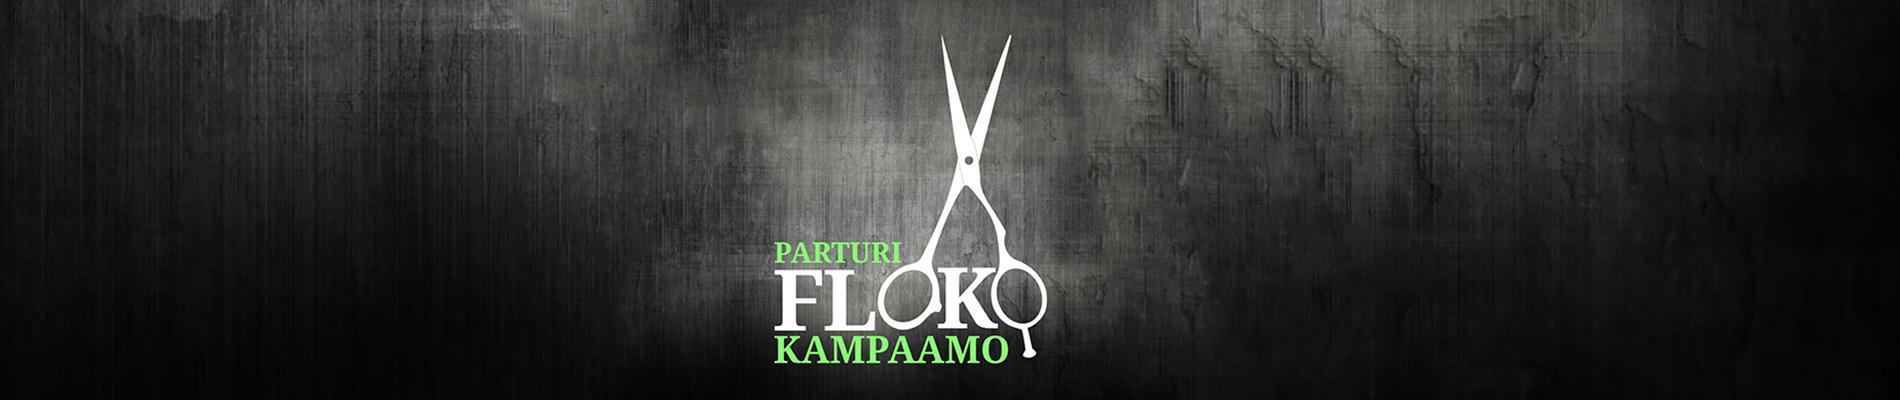 Parturi-Kampaamo Floko